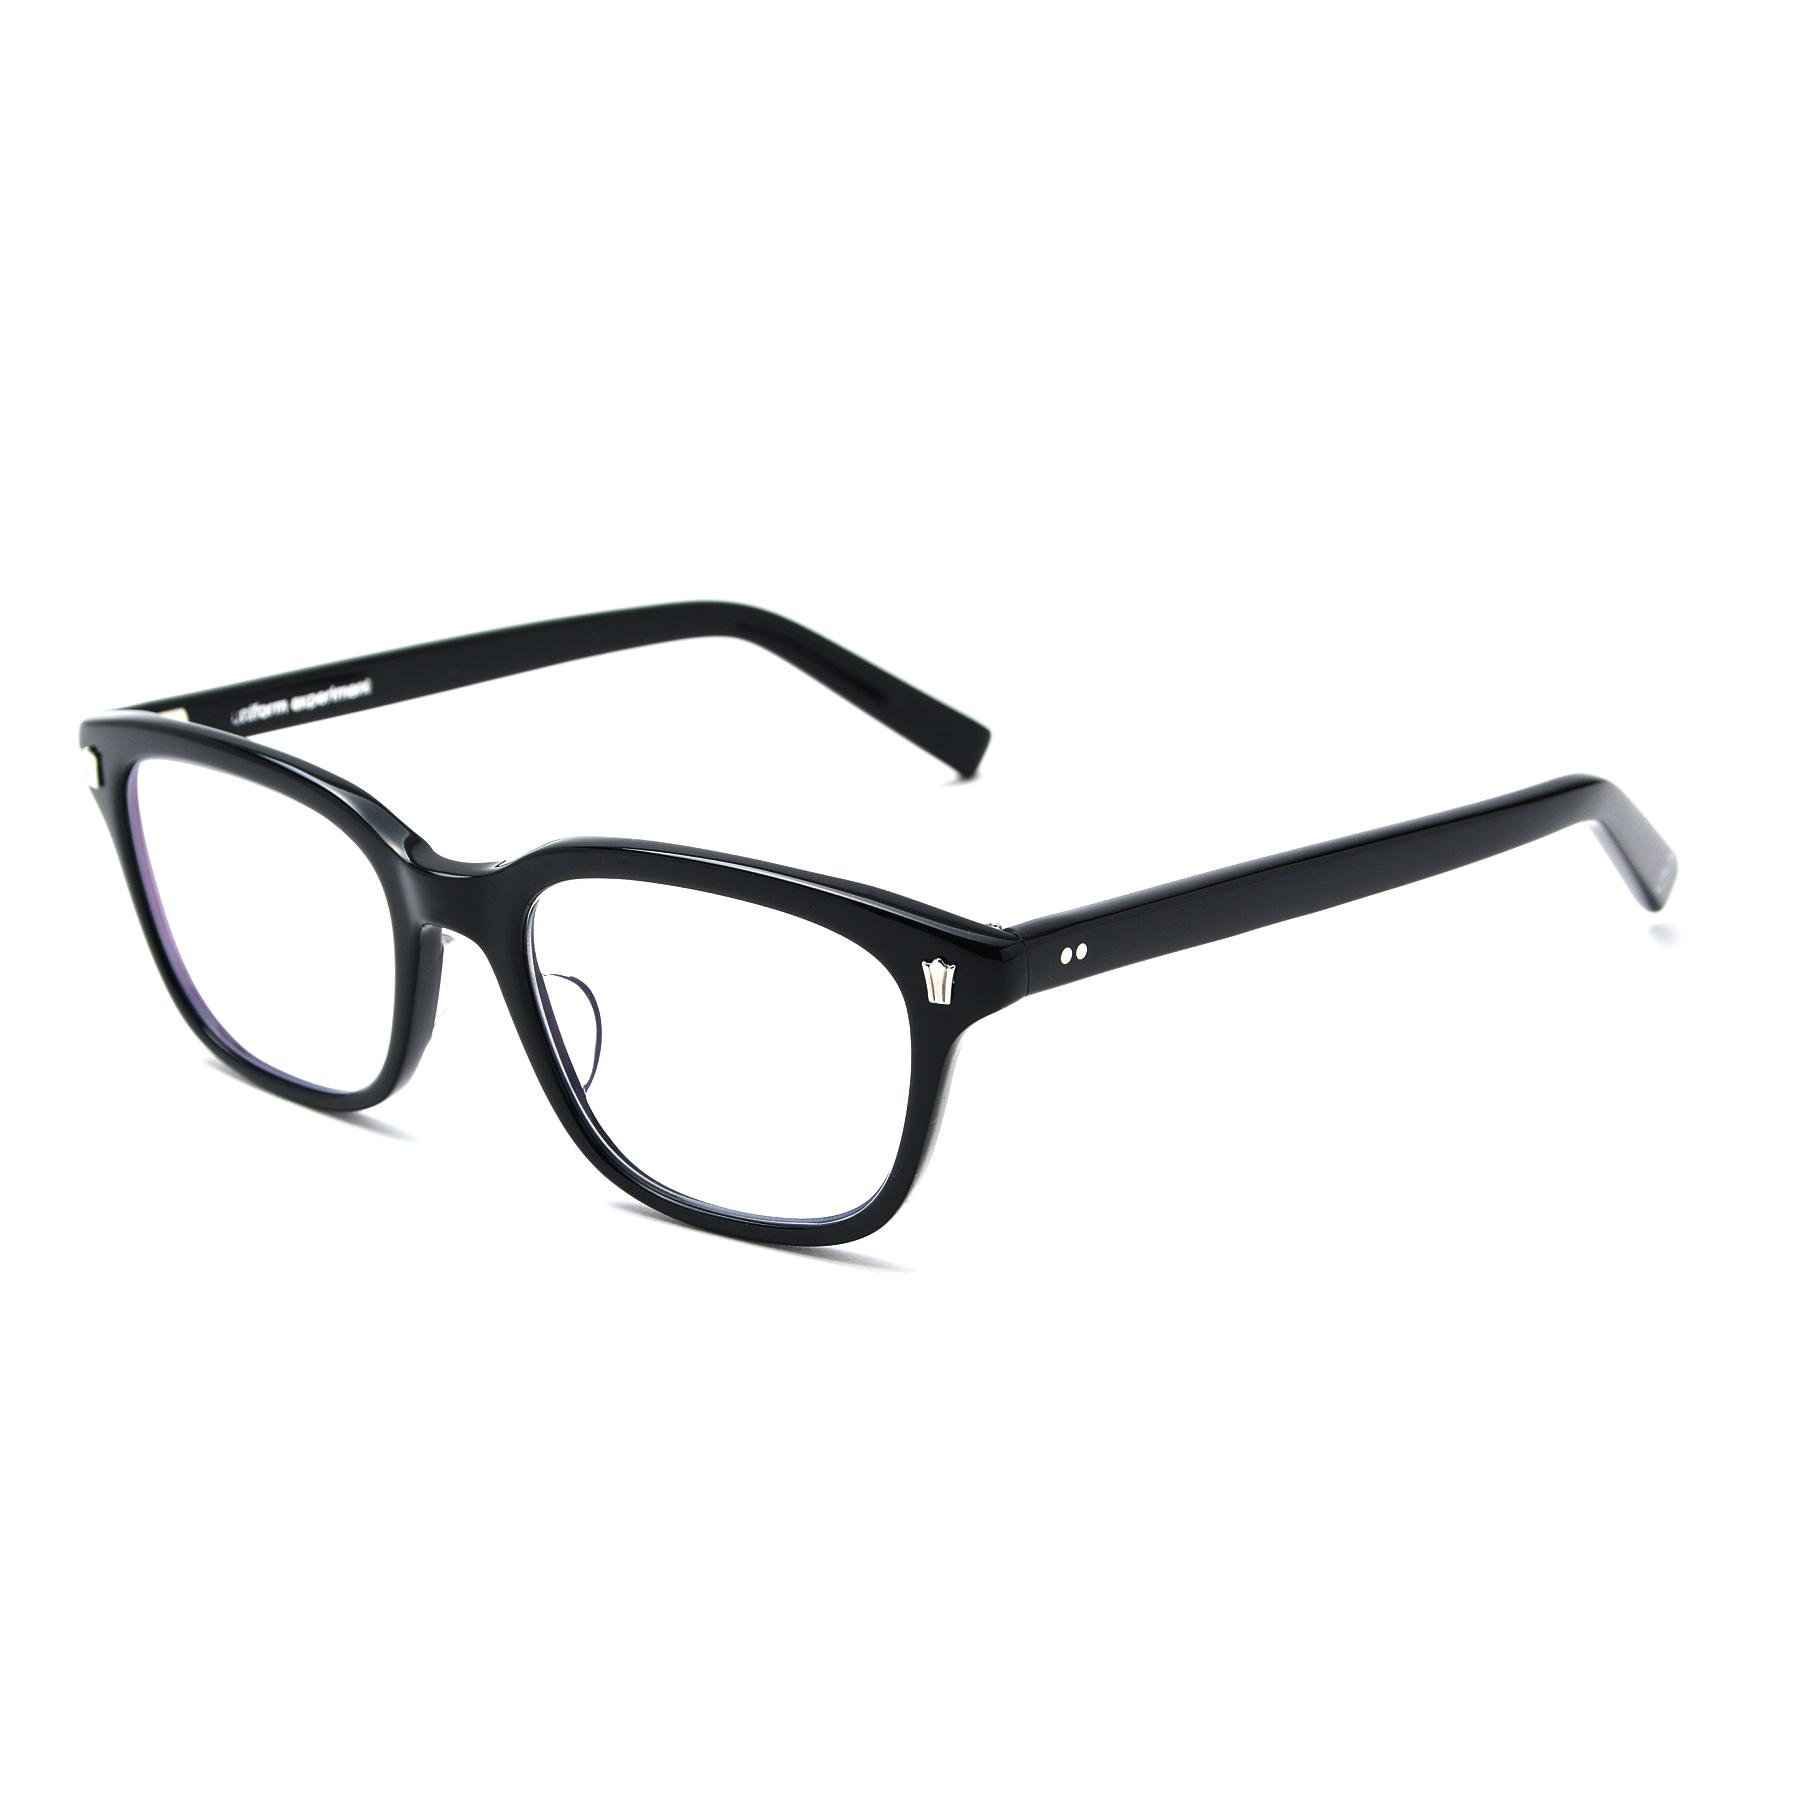 uniform experiment / 泰八郎謹製 GLASSES (Black)